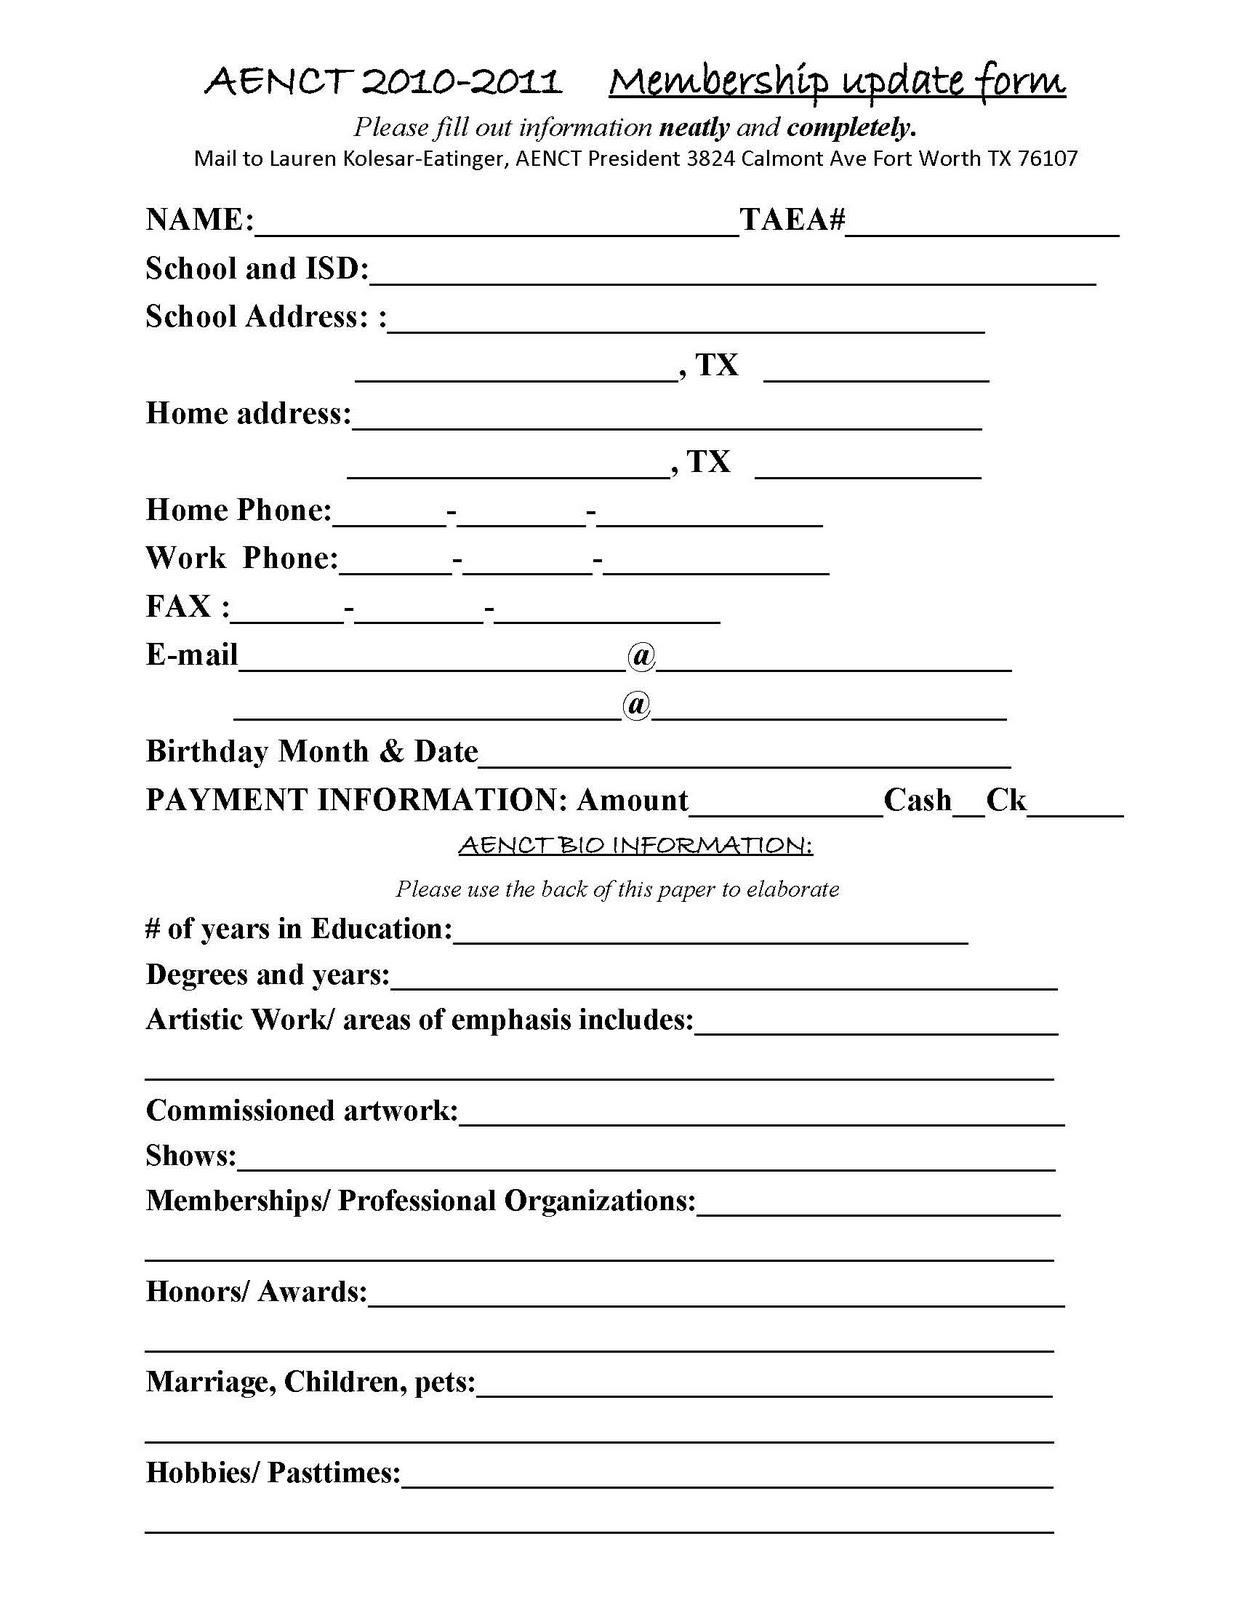 Membership Templates printable gym membership termination letter – Club Membership Form Template Word